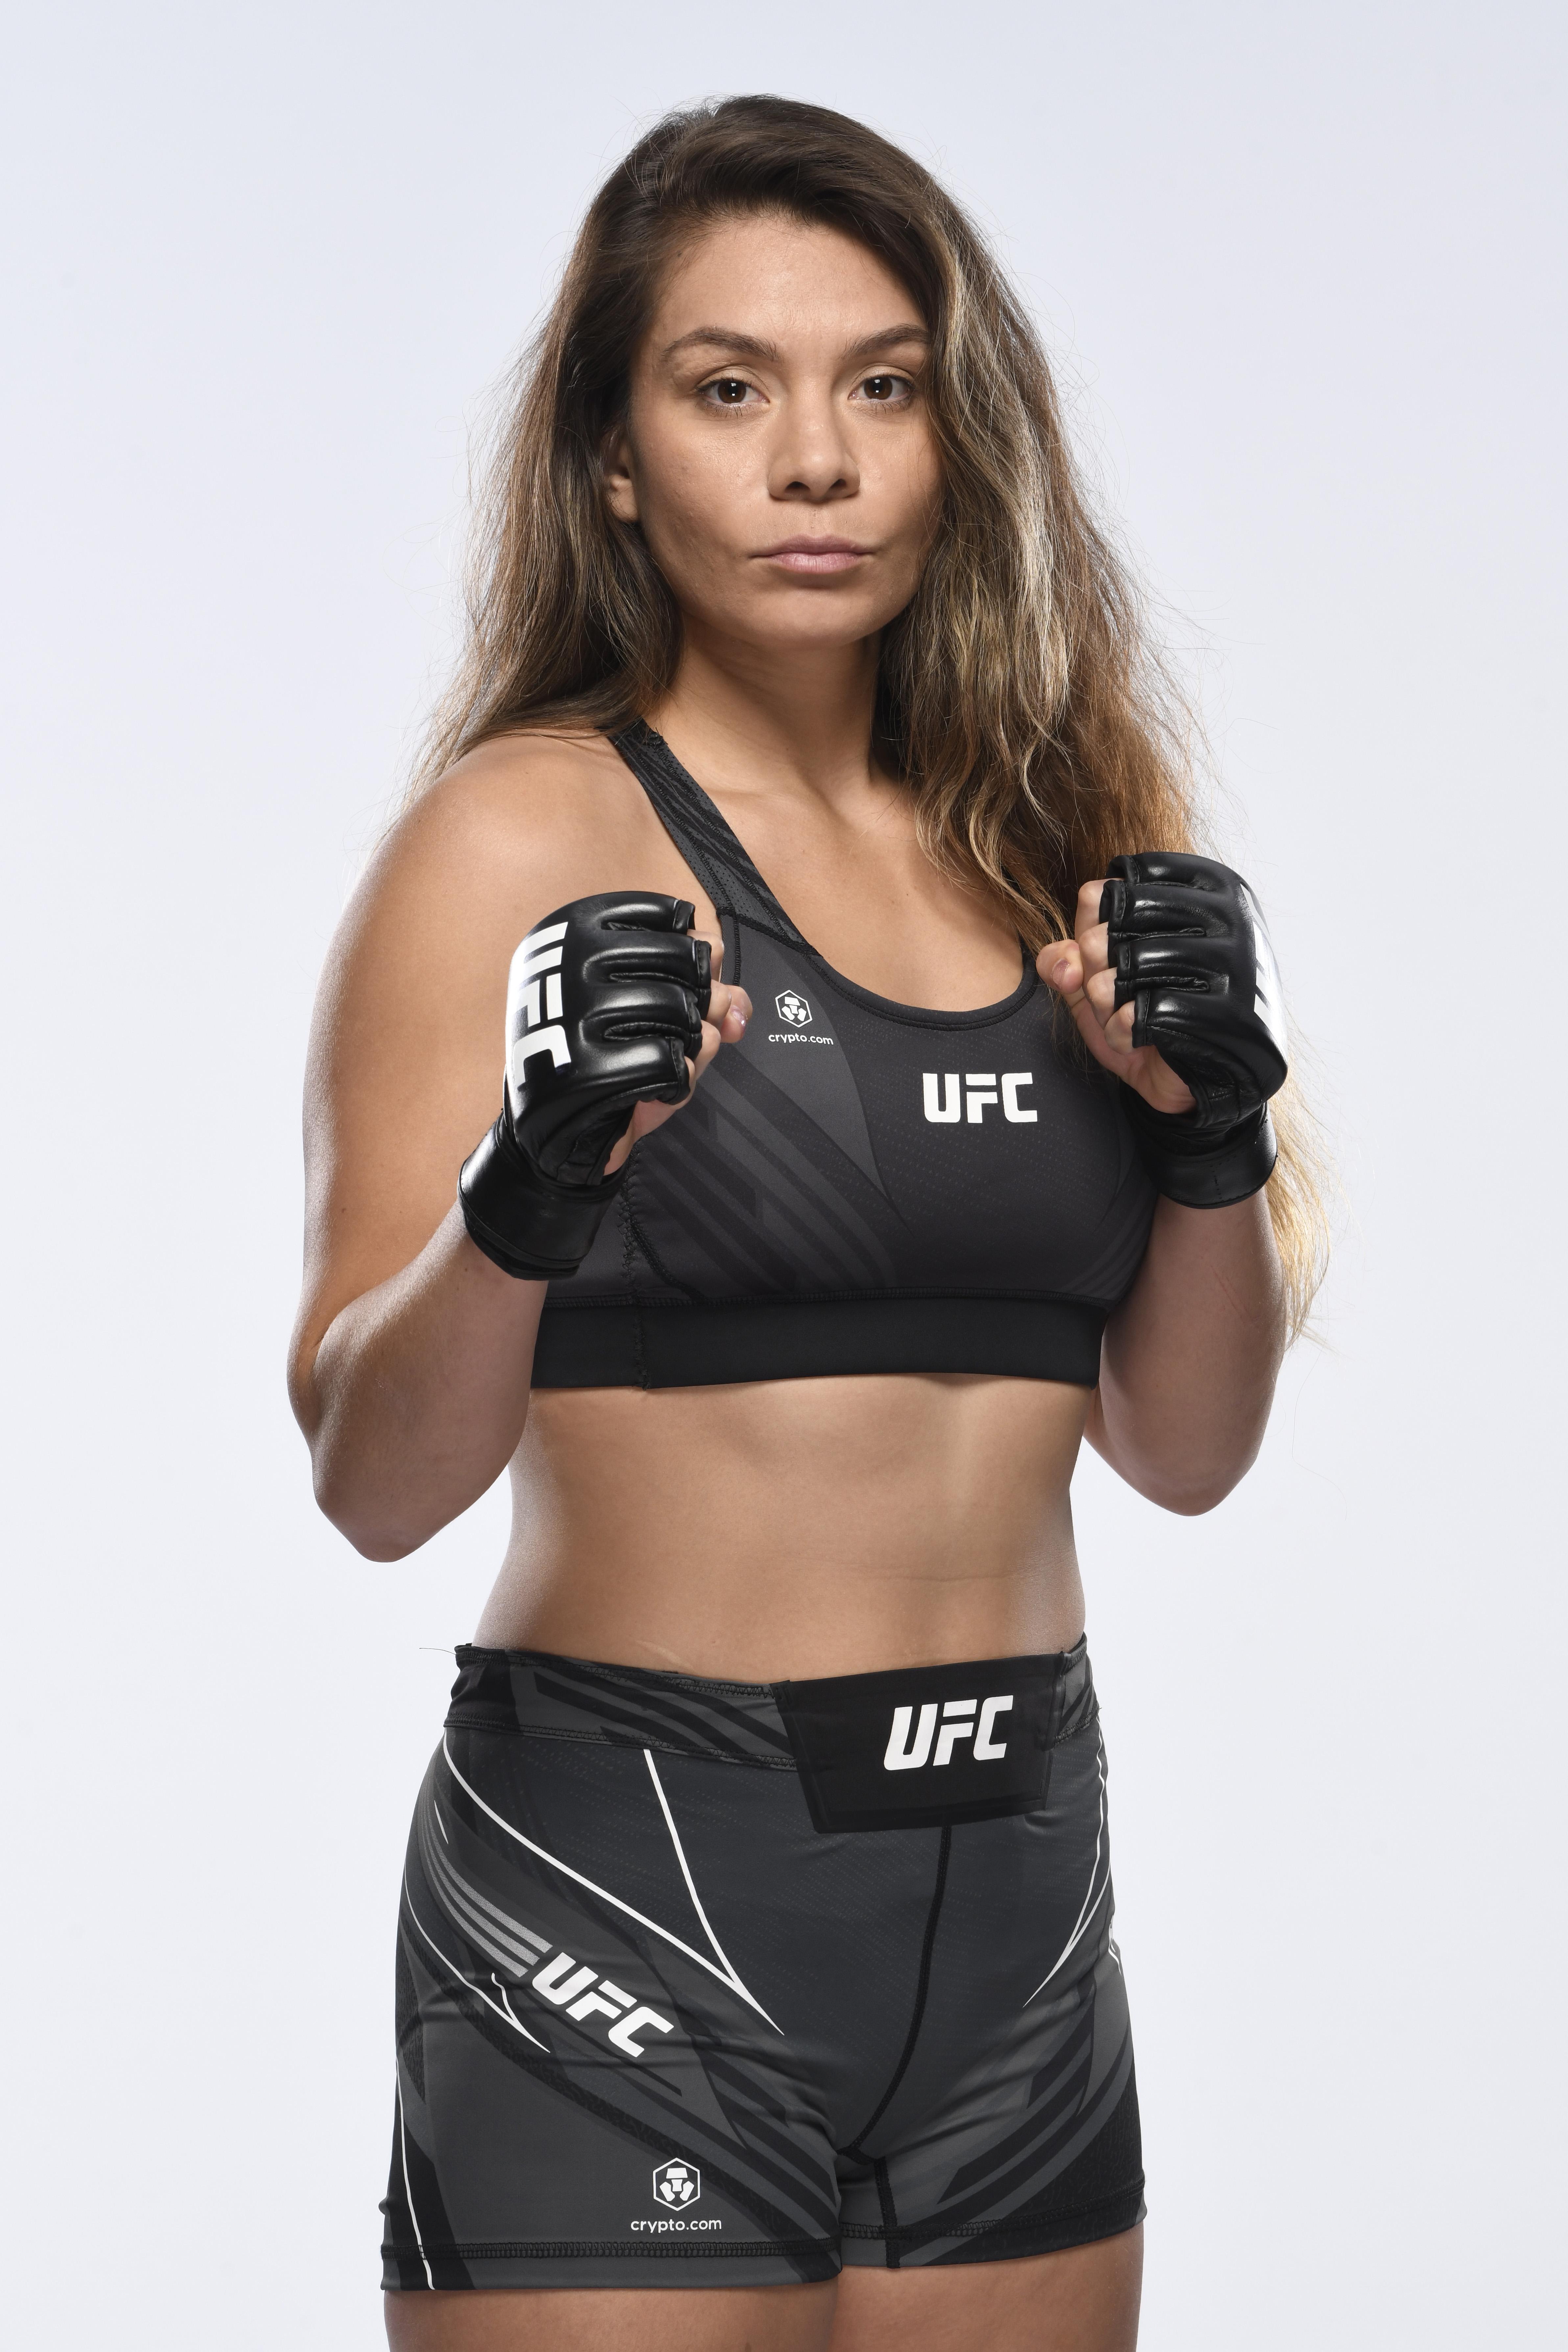 UFC Fighter Portraits - Nicco Montano